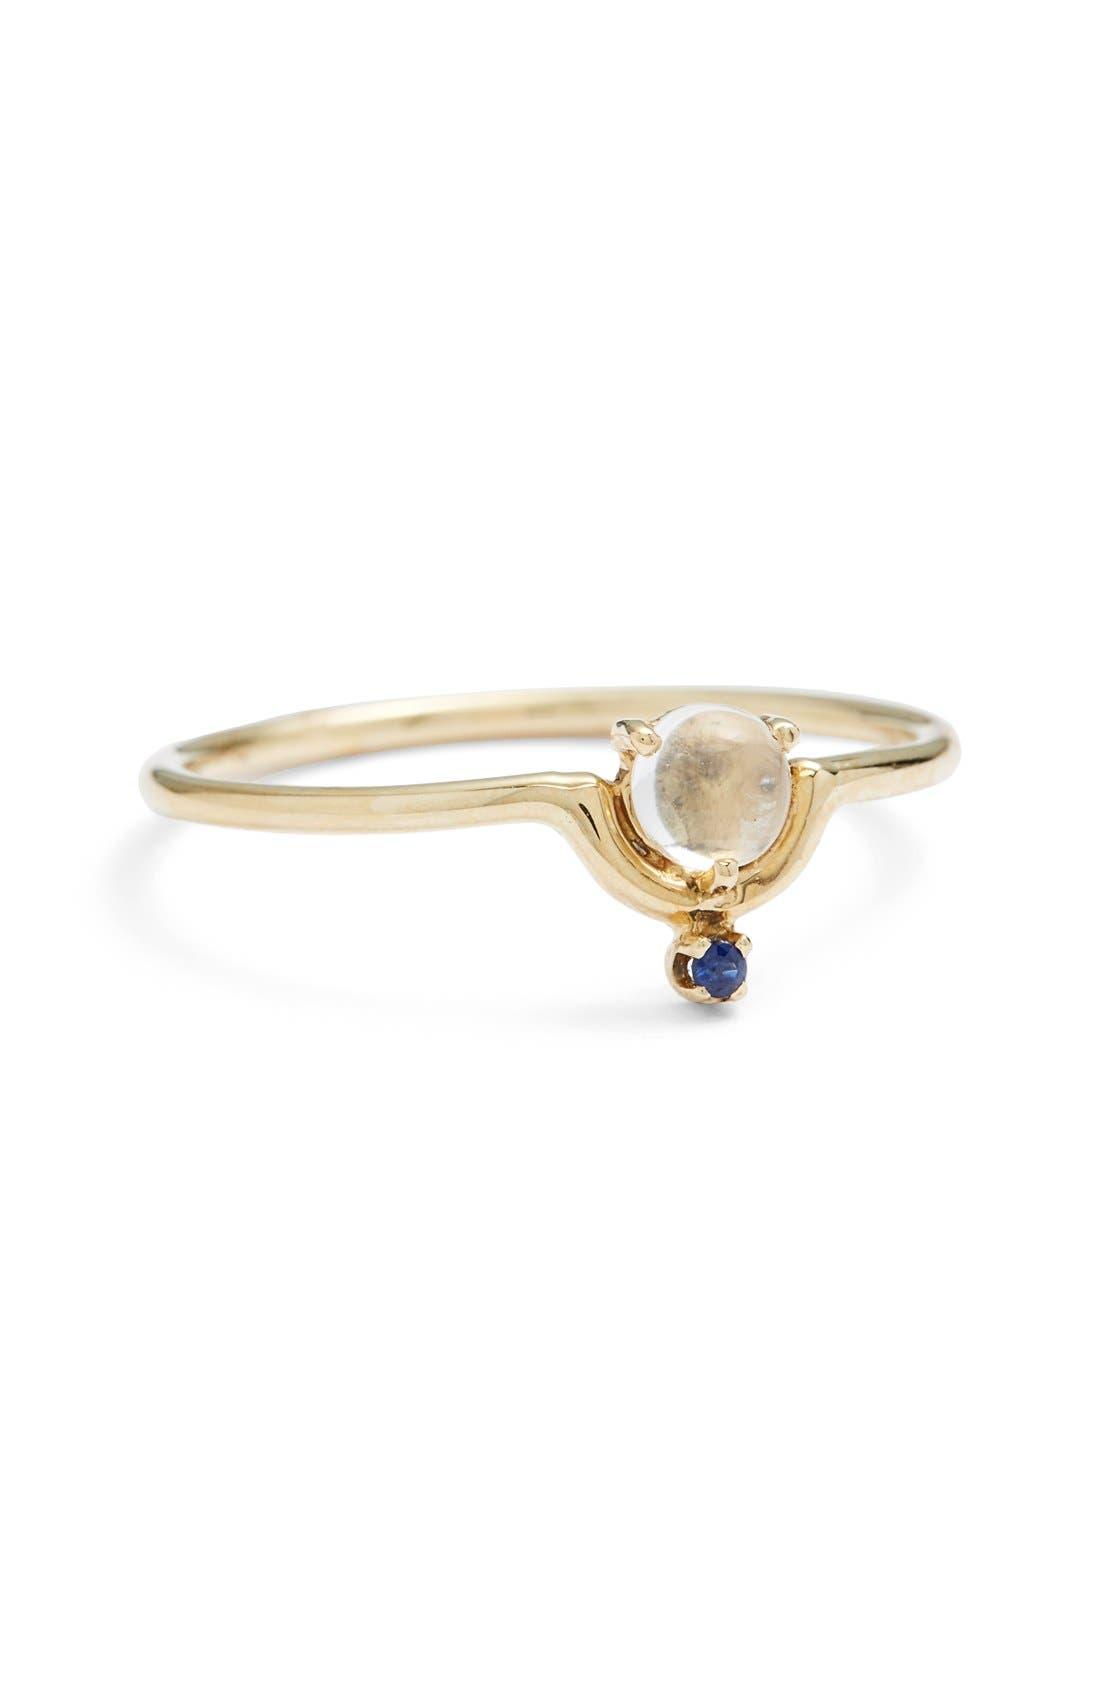 Main Image - WWAKE Nestled Moonstone & Sapphire Ring